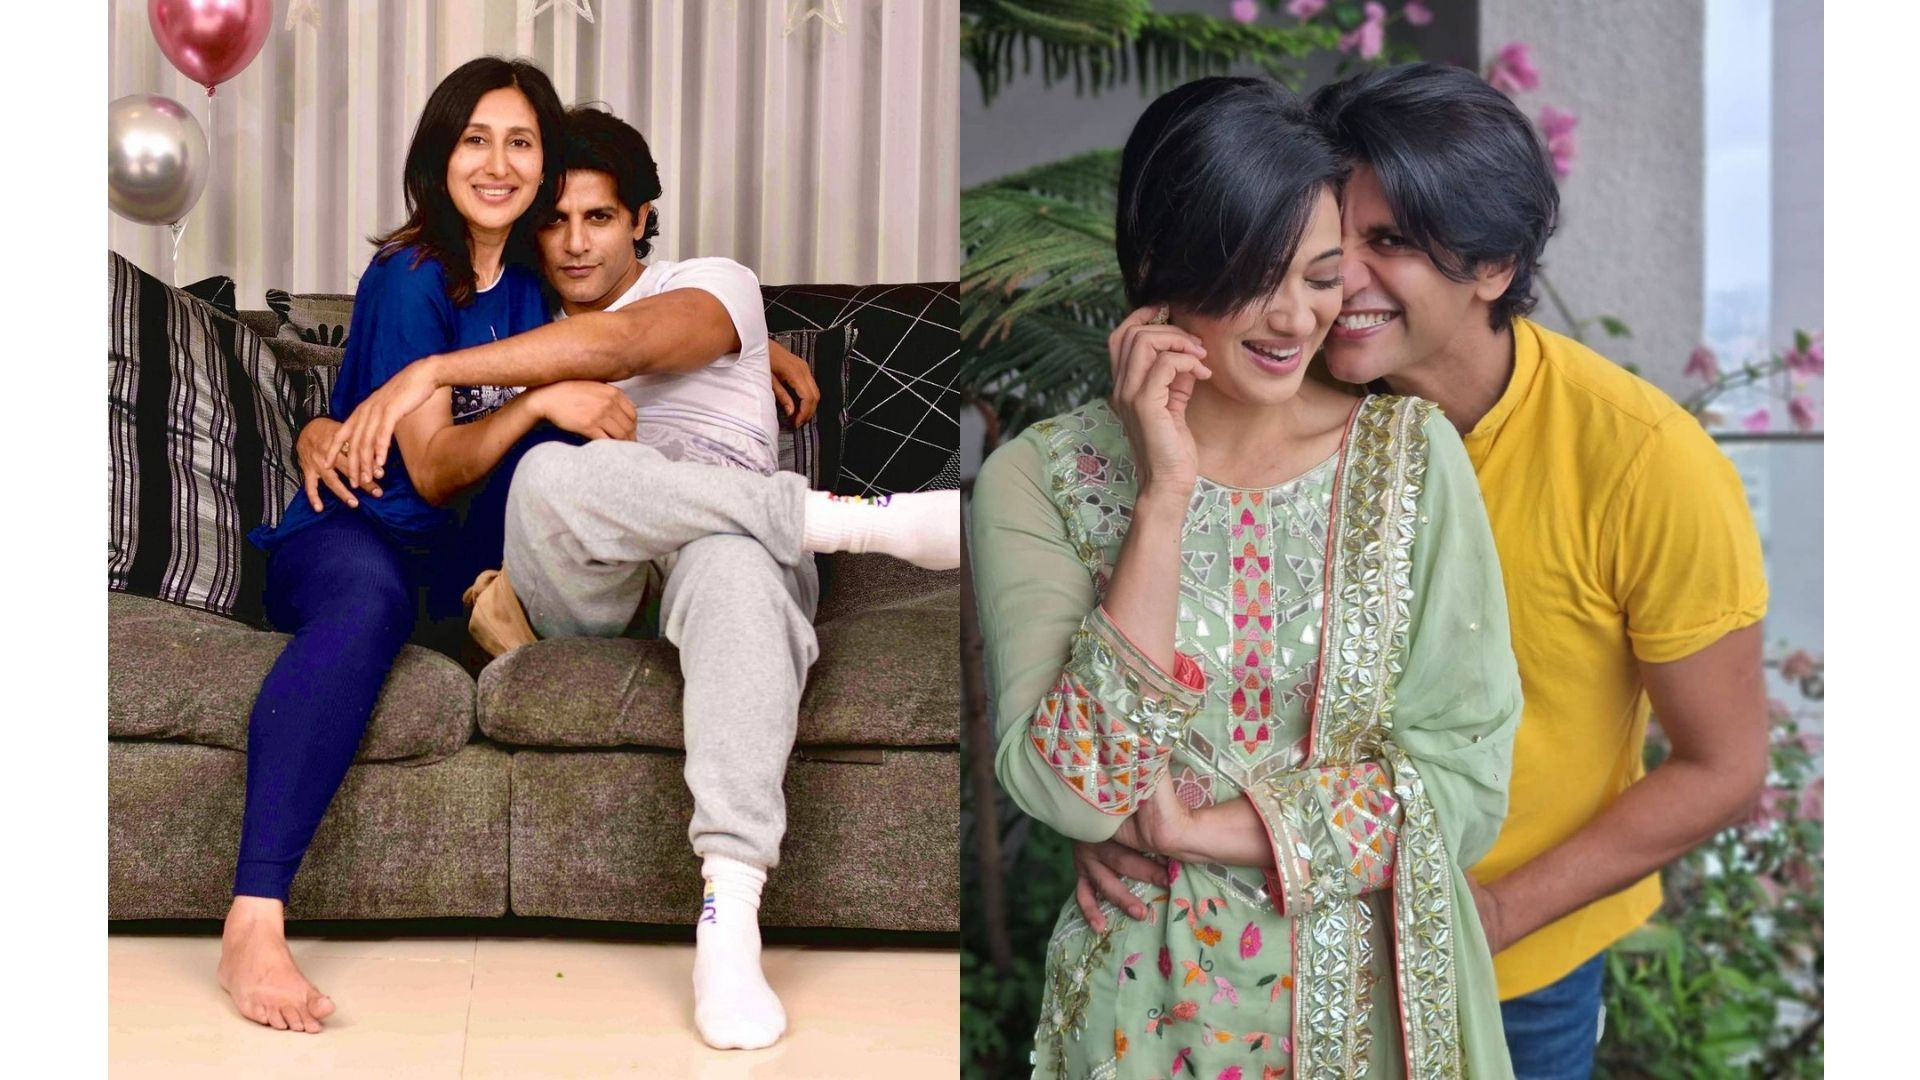 Karanvir Bohra Pokes Fun At Shweta Tiwari And Wife Teejay Sidhu For Talking Endlessly; Watch This Hilarious Video